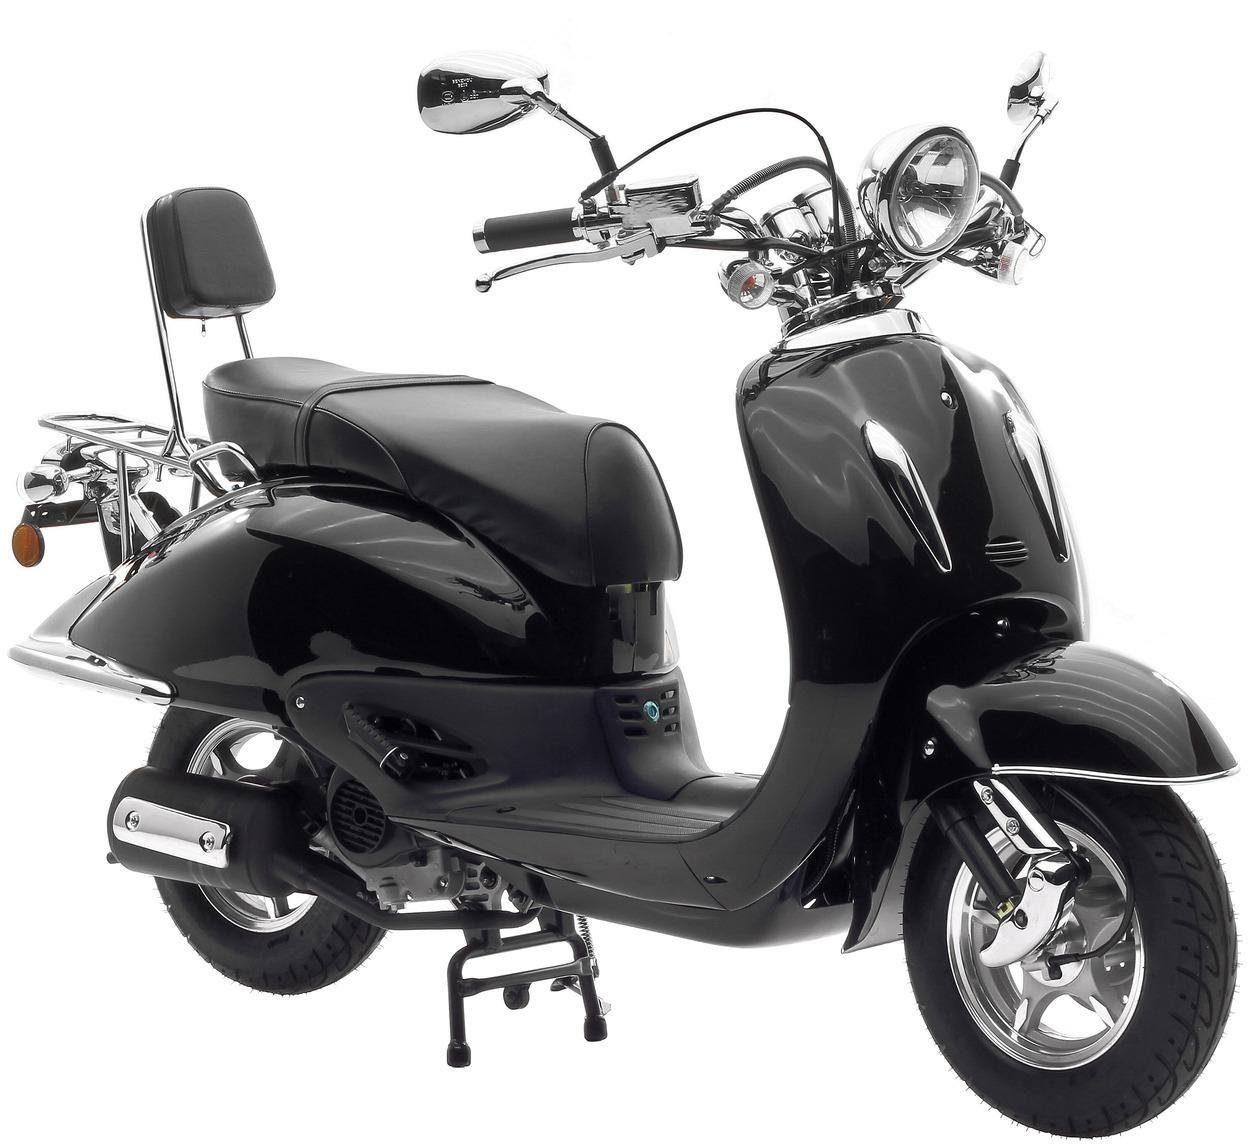 Nova Motors Motorroller »Retro Cruiser Euro 4«, 49 ccm, 45 km/h, Euro 4